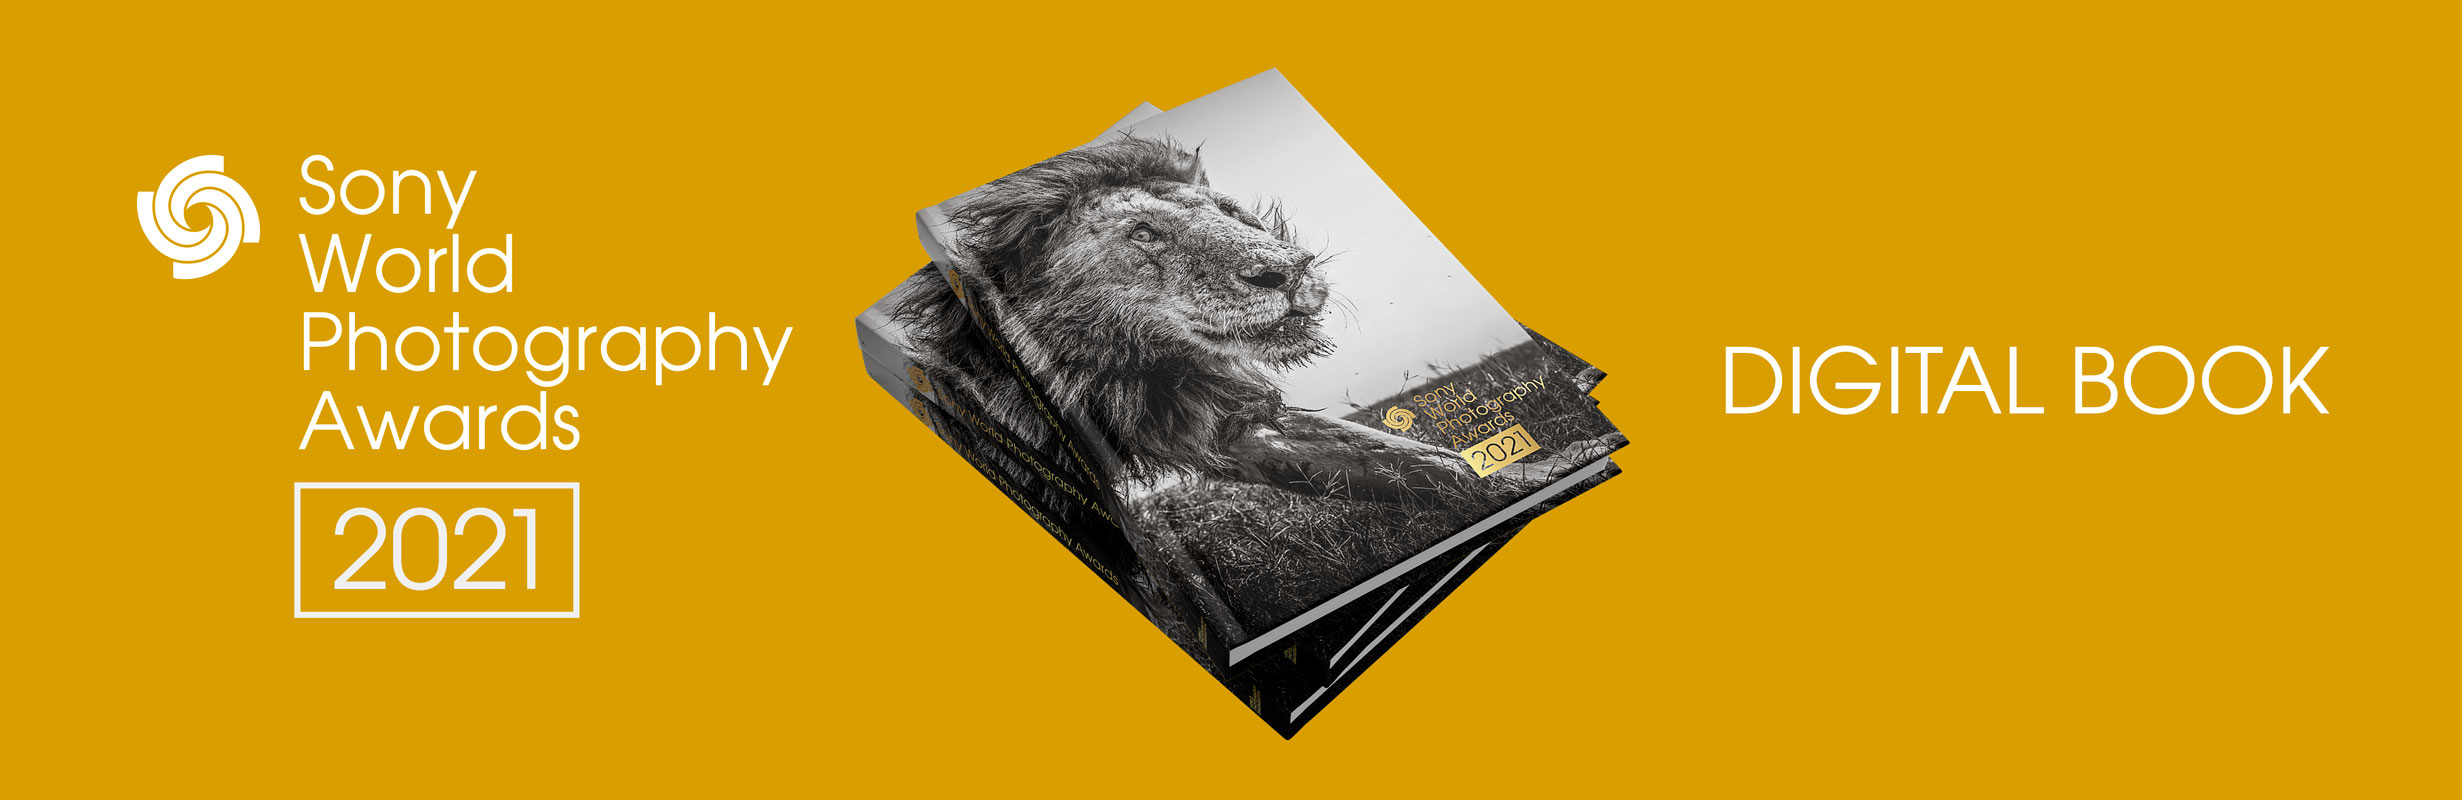 Книга Sony World Photography Awards 2021